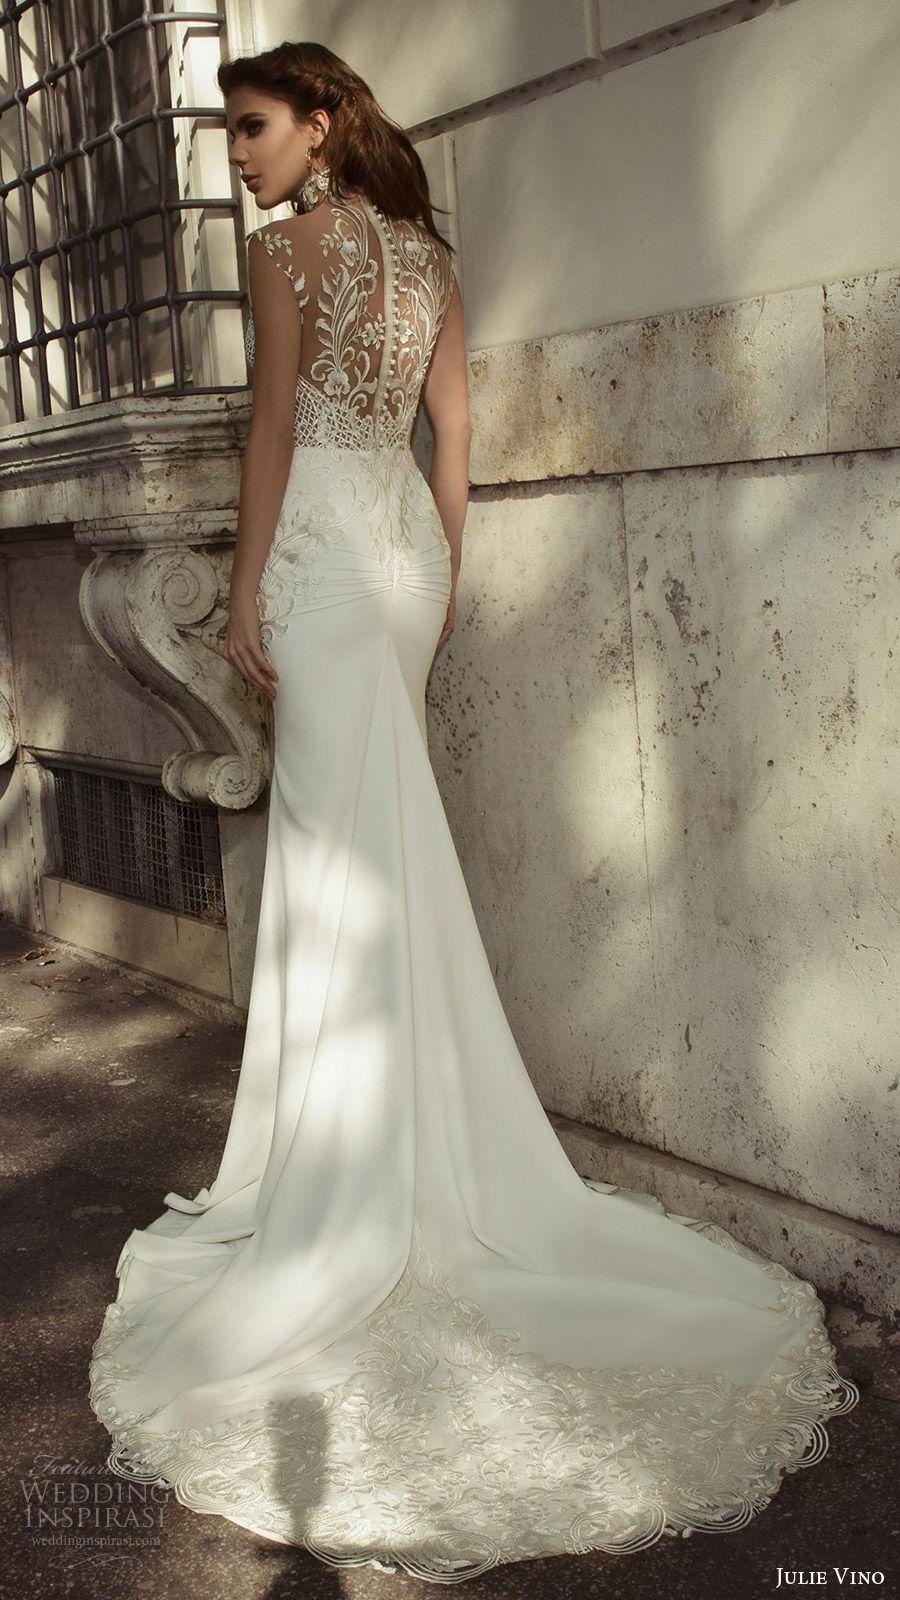 julie vino bridal spring 2017 sleeveless sweetheart illusion high neck sheath wedding dress (octavia) bv sheer back train